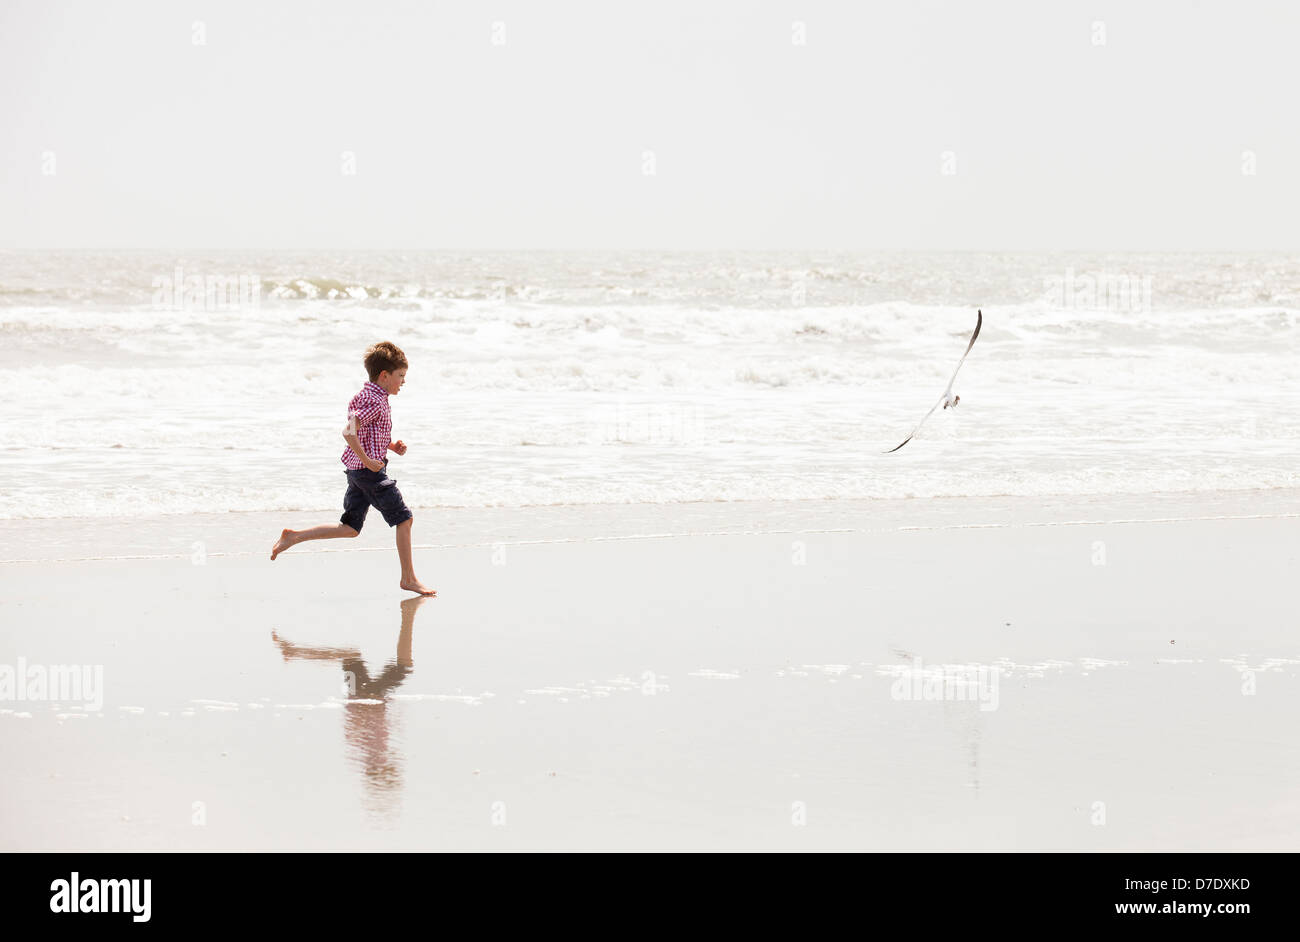 boy running on beach - Stock Image